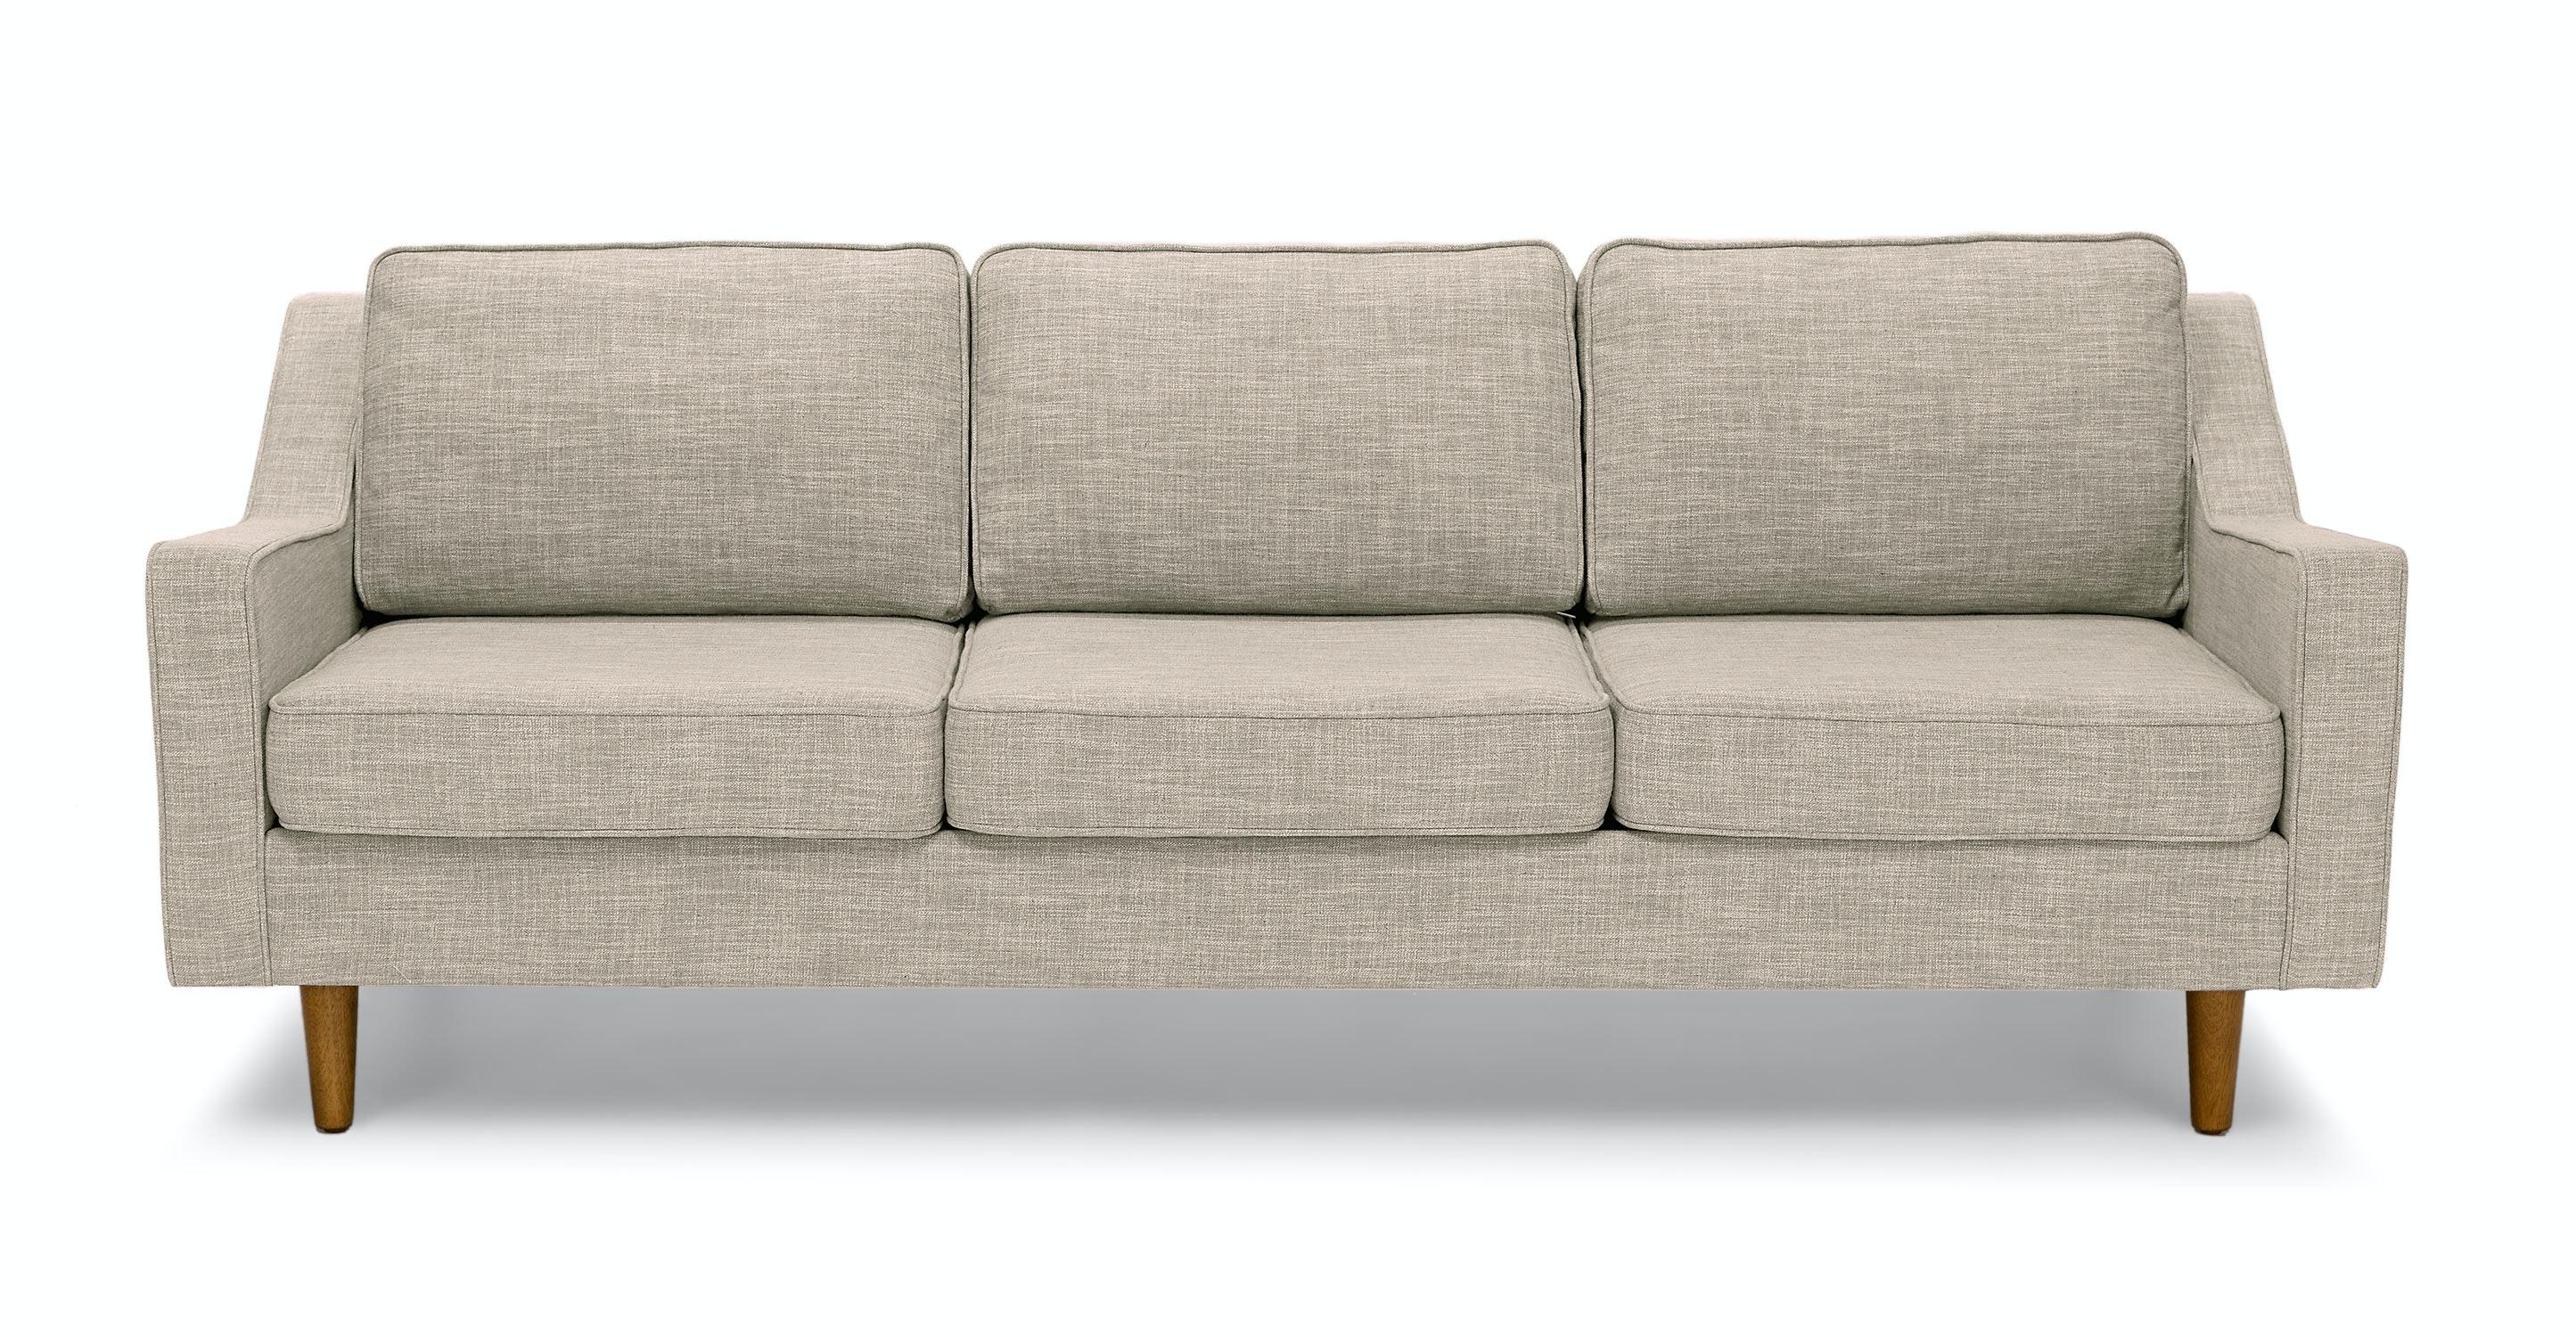 Slope Rain Cloud Gray Sofa Sofas Article